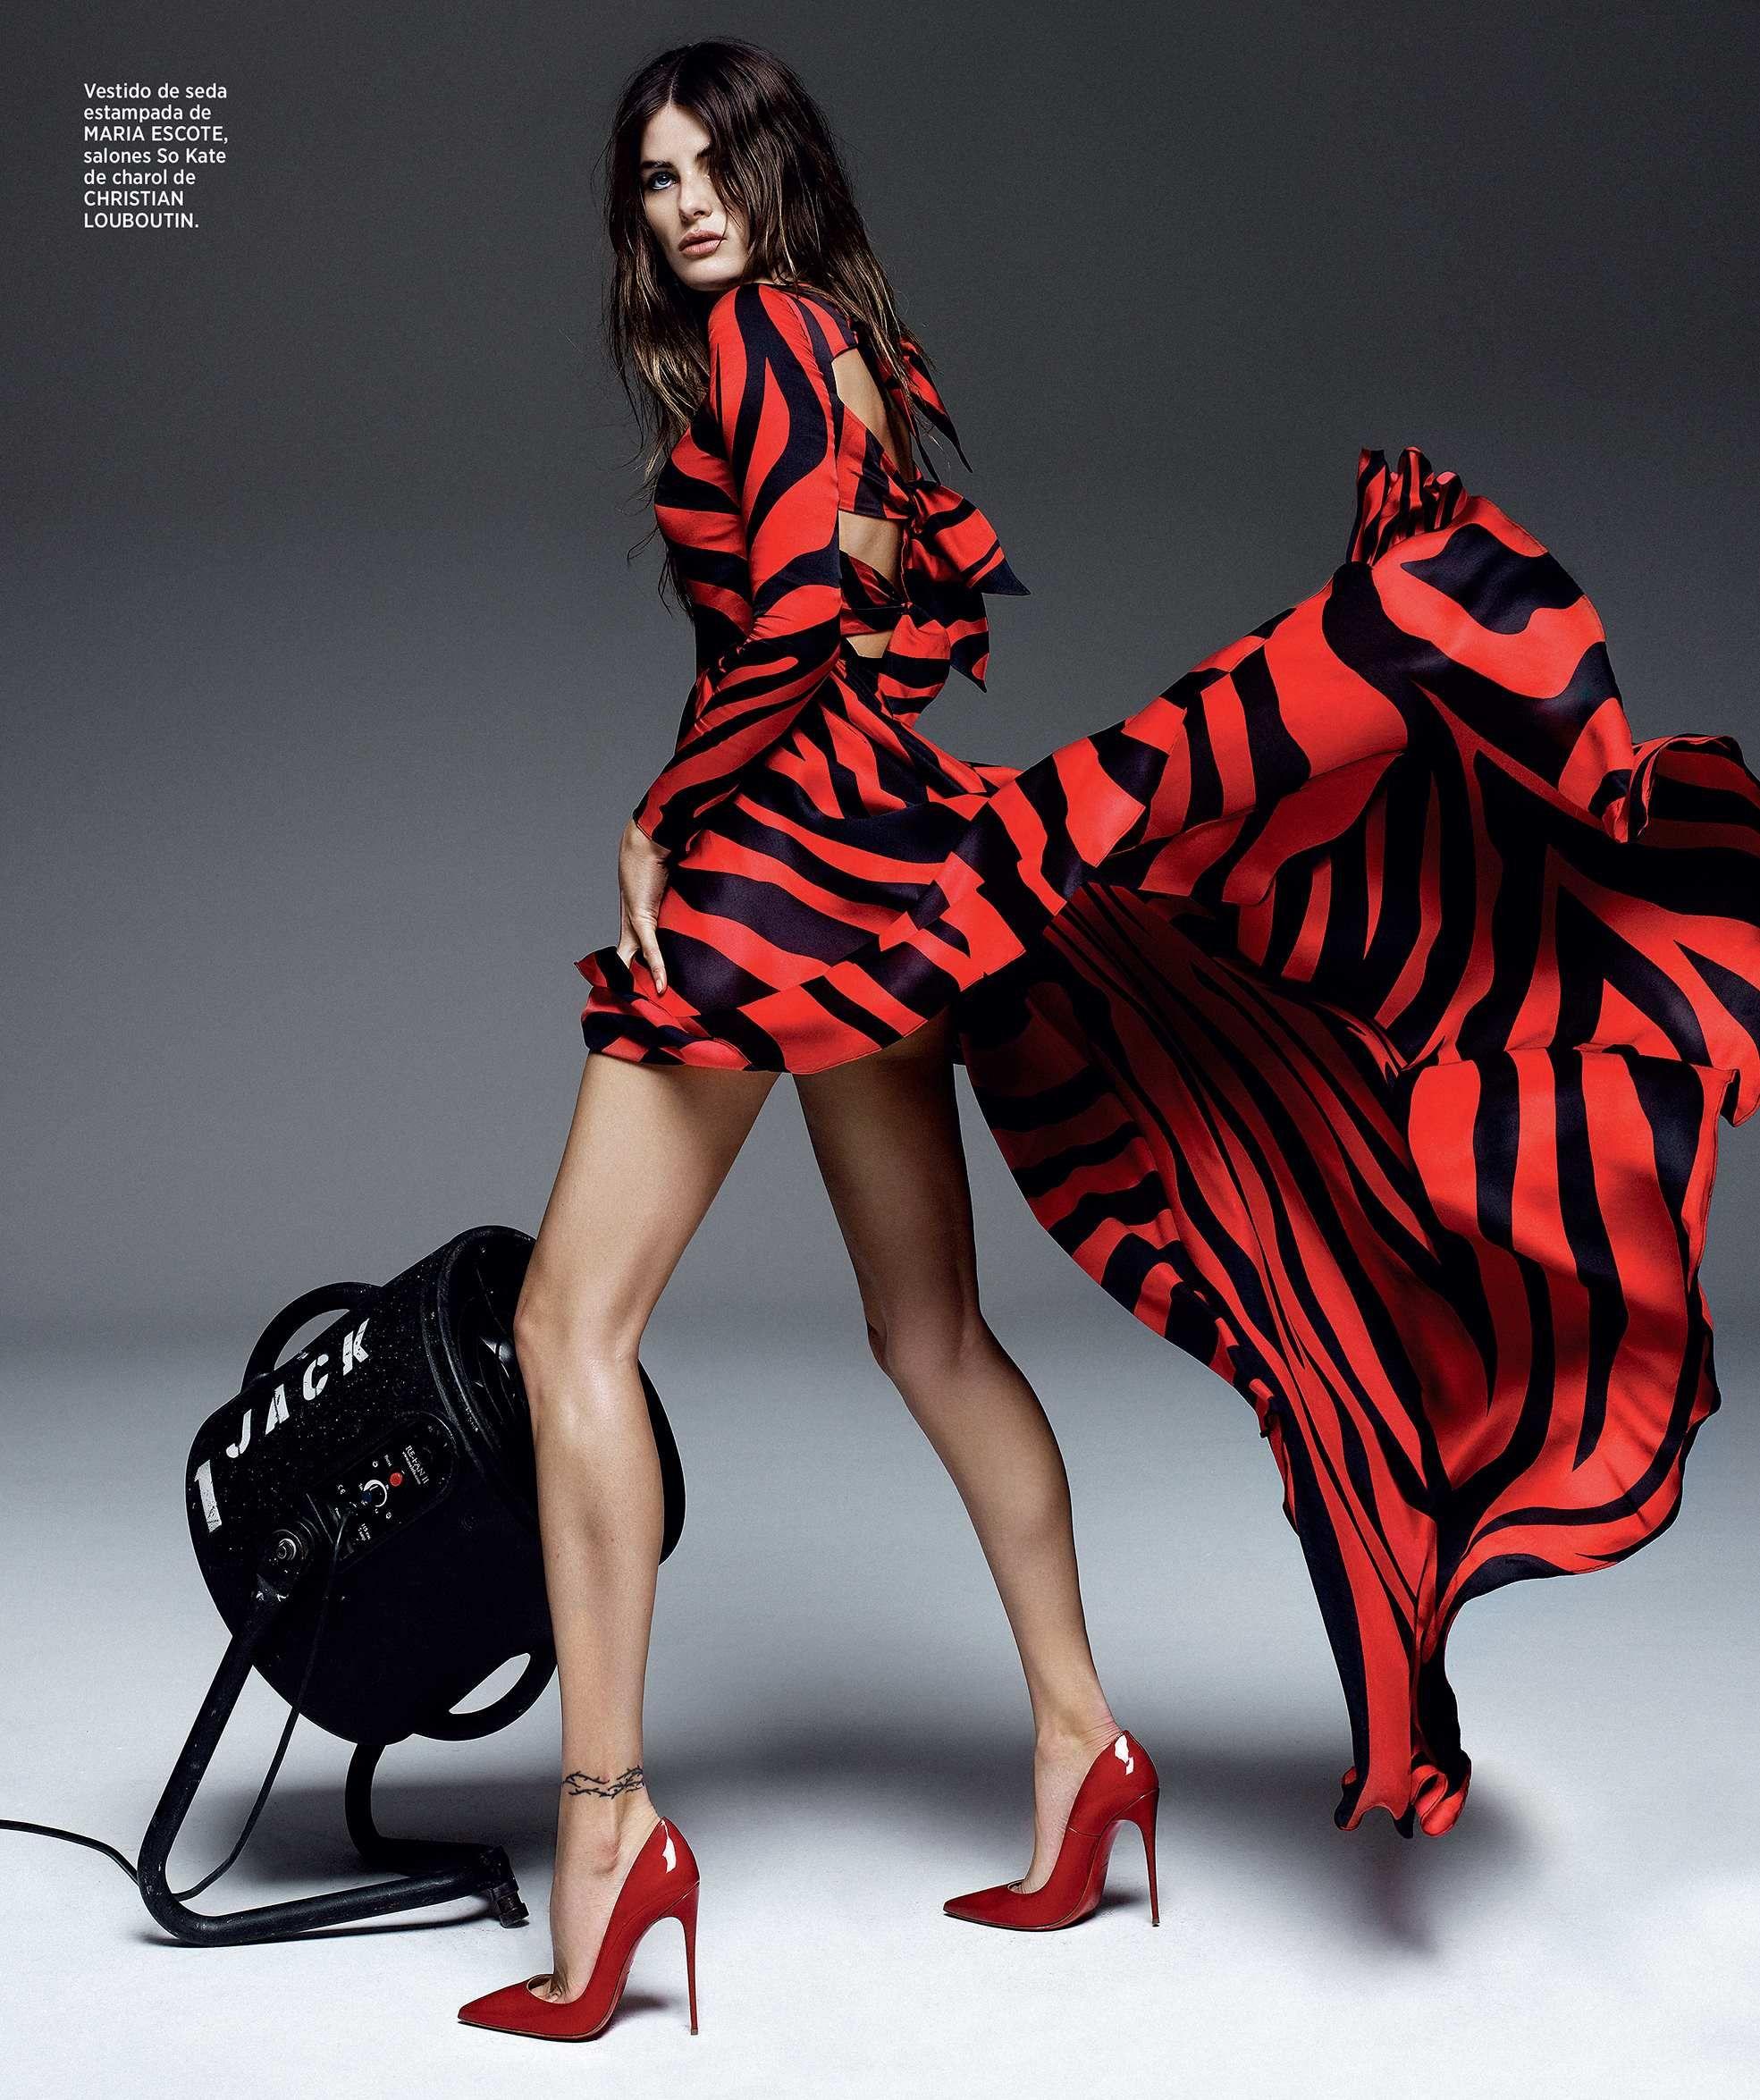 fashion-photography-salary-photo-retouching-sample